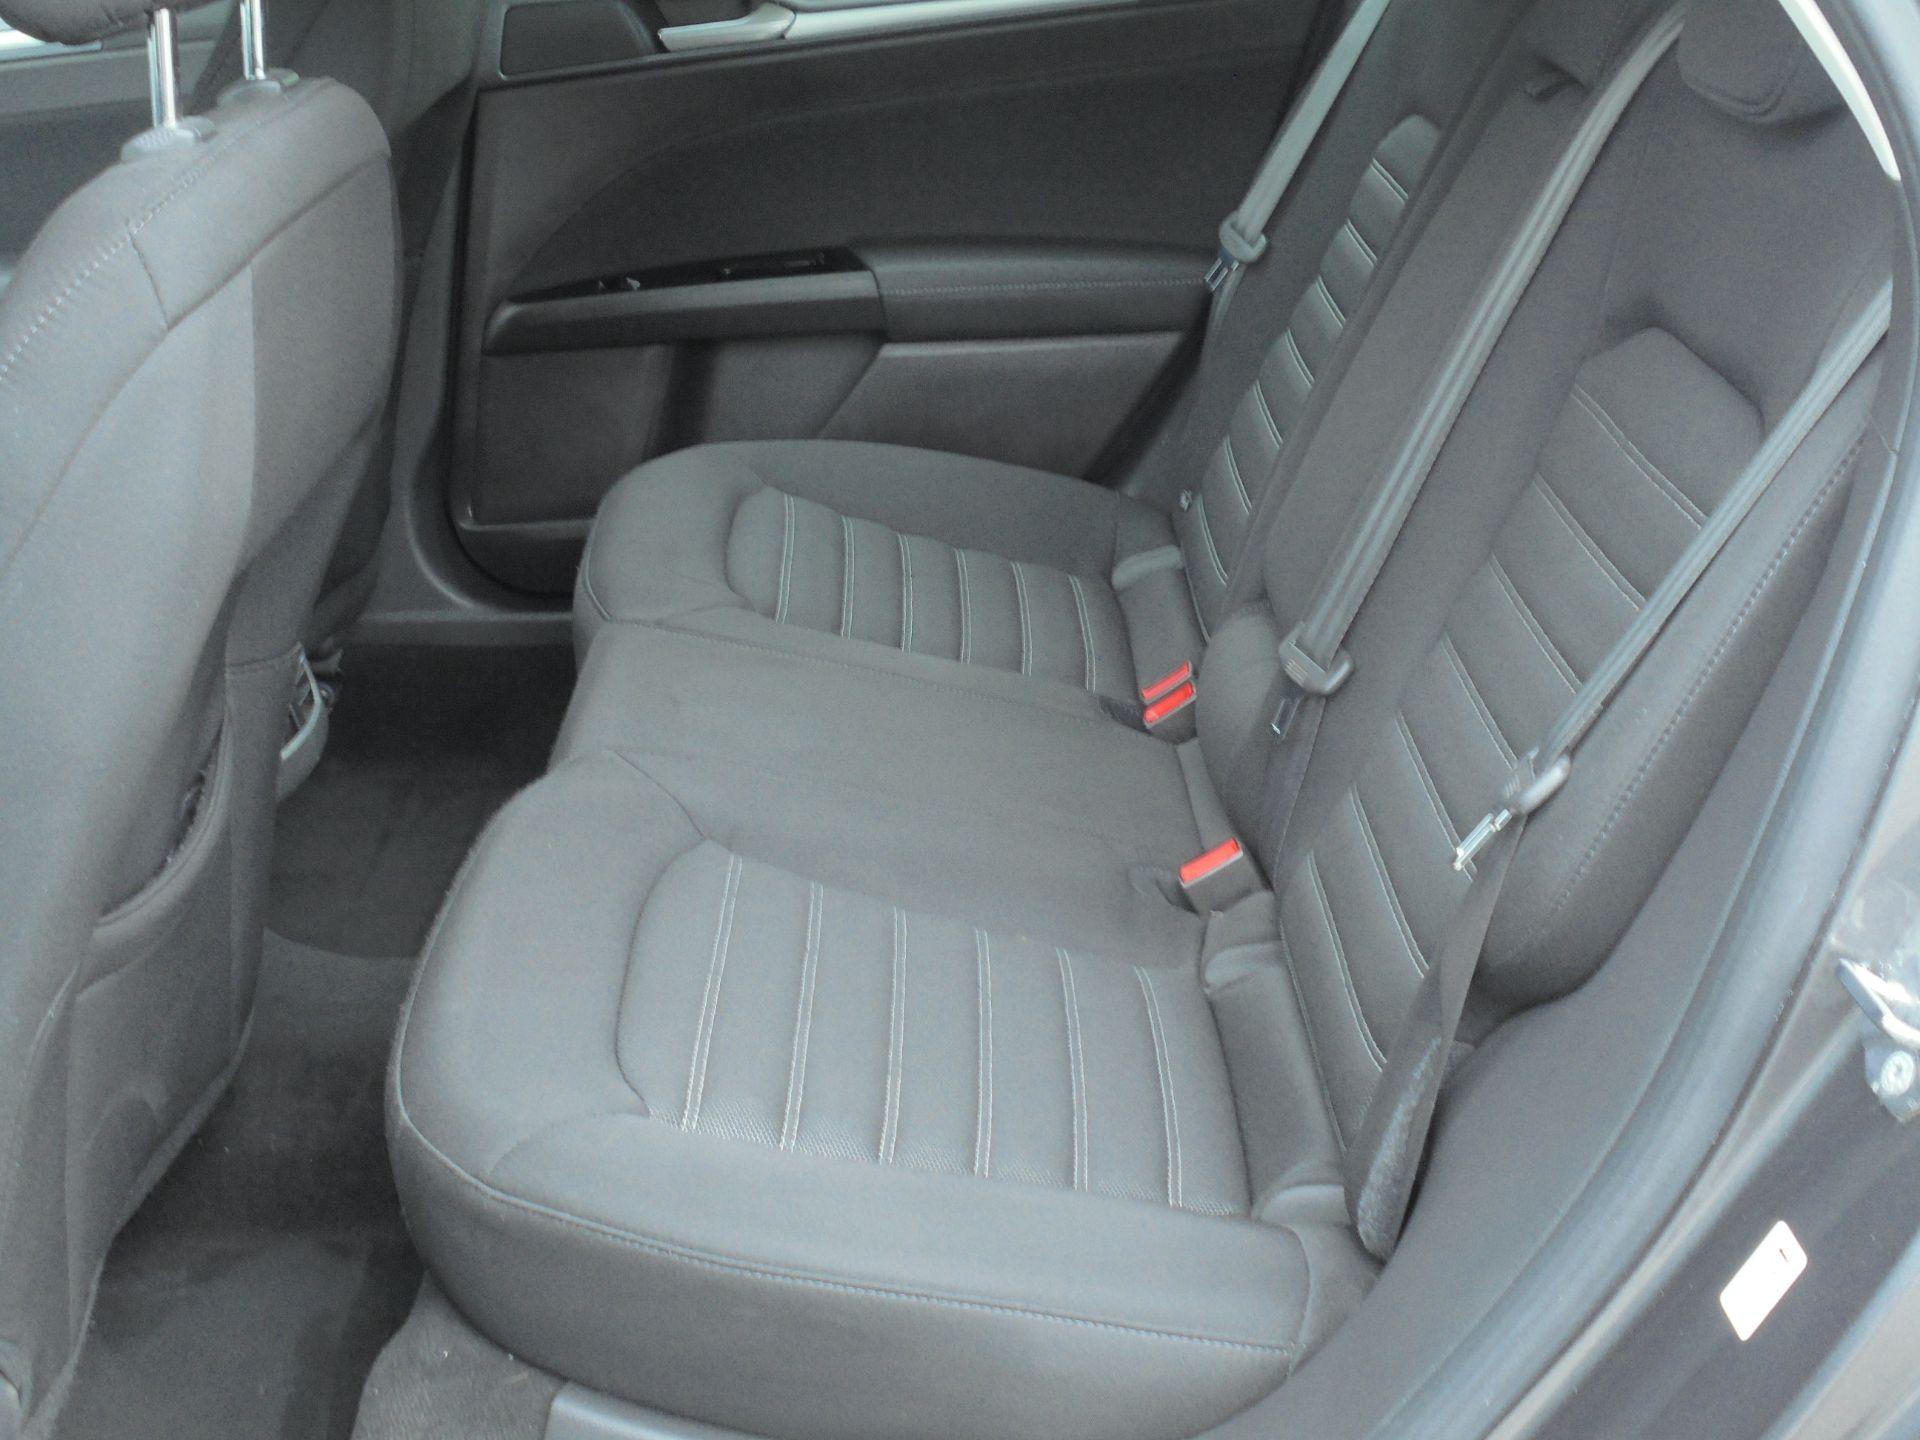 2017 Ford Mondeo 2.0 Tdci Econetic Zetec 5Dr [Nav] (WM17RHO) Image 6